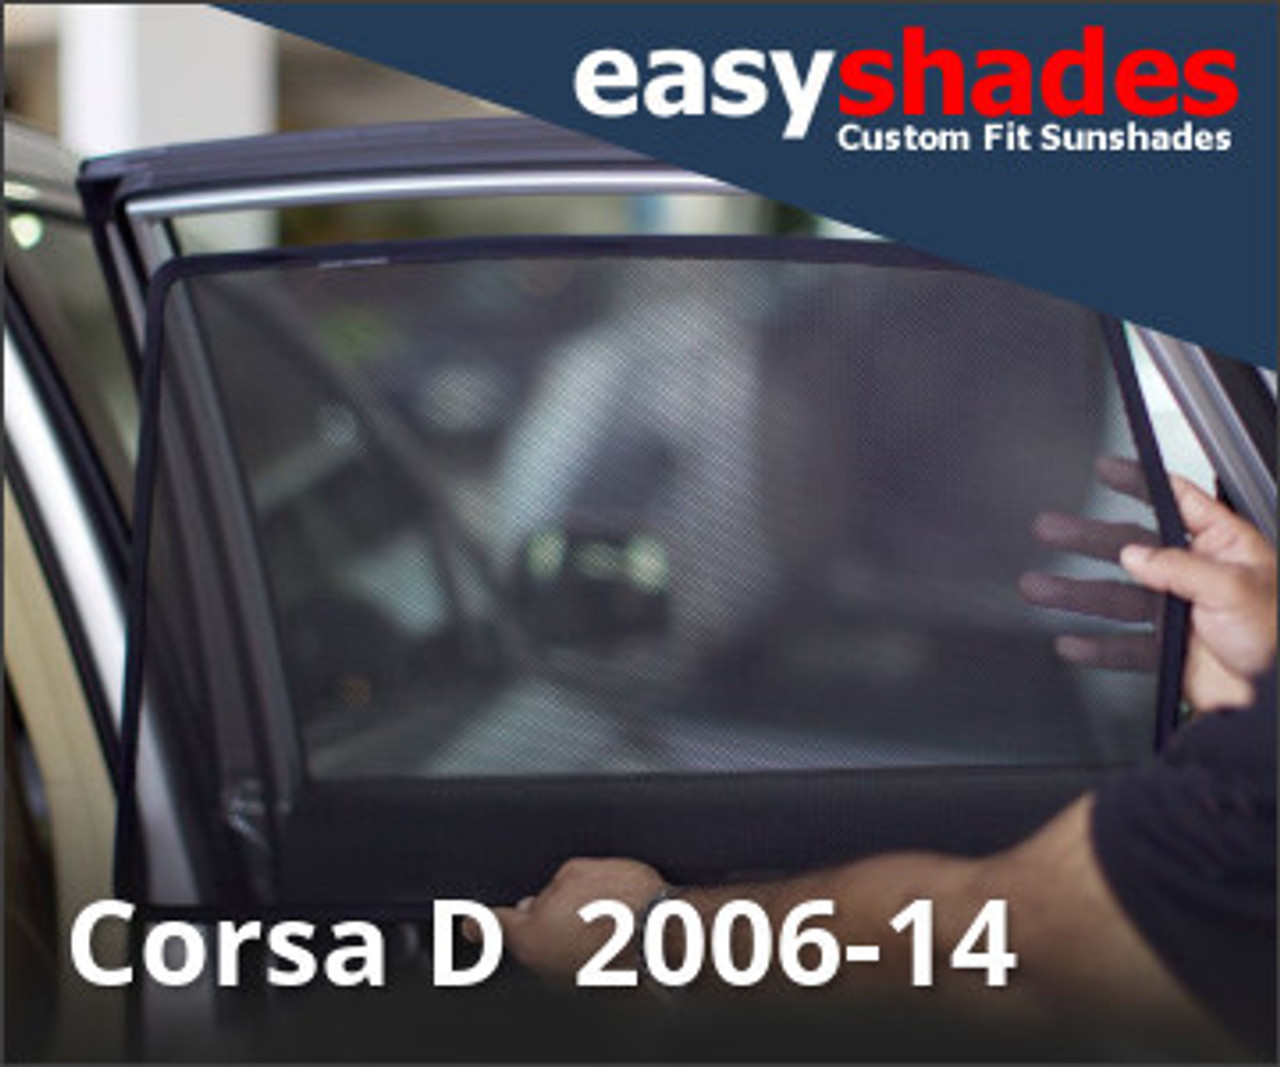 Corsa D 2006-14